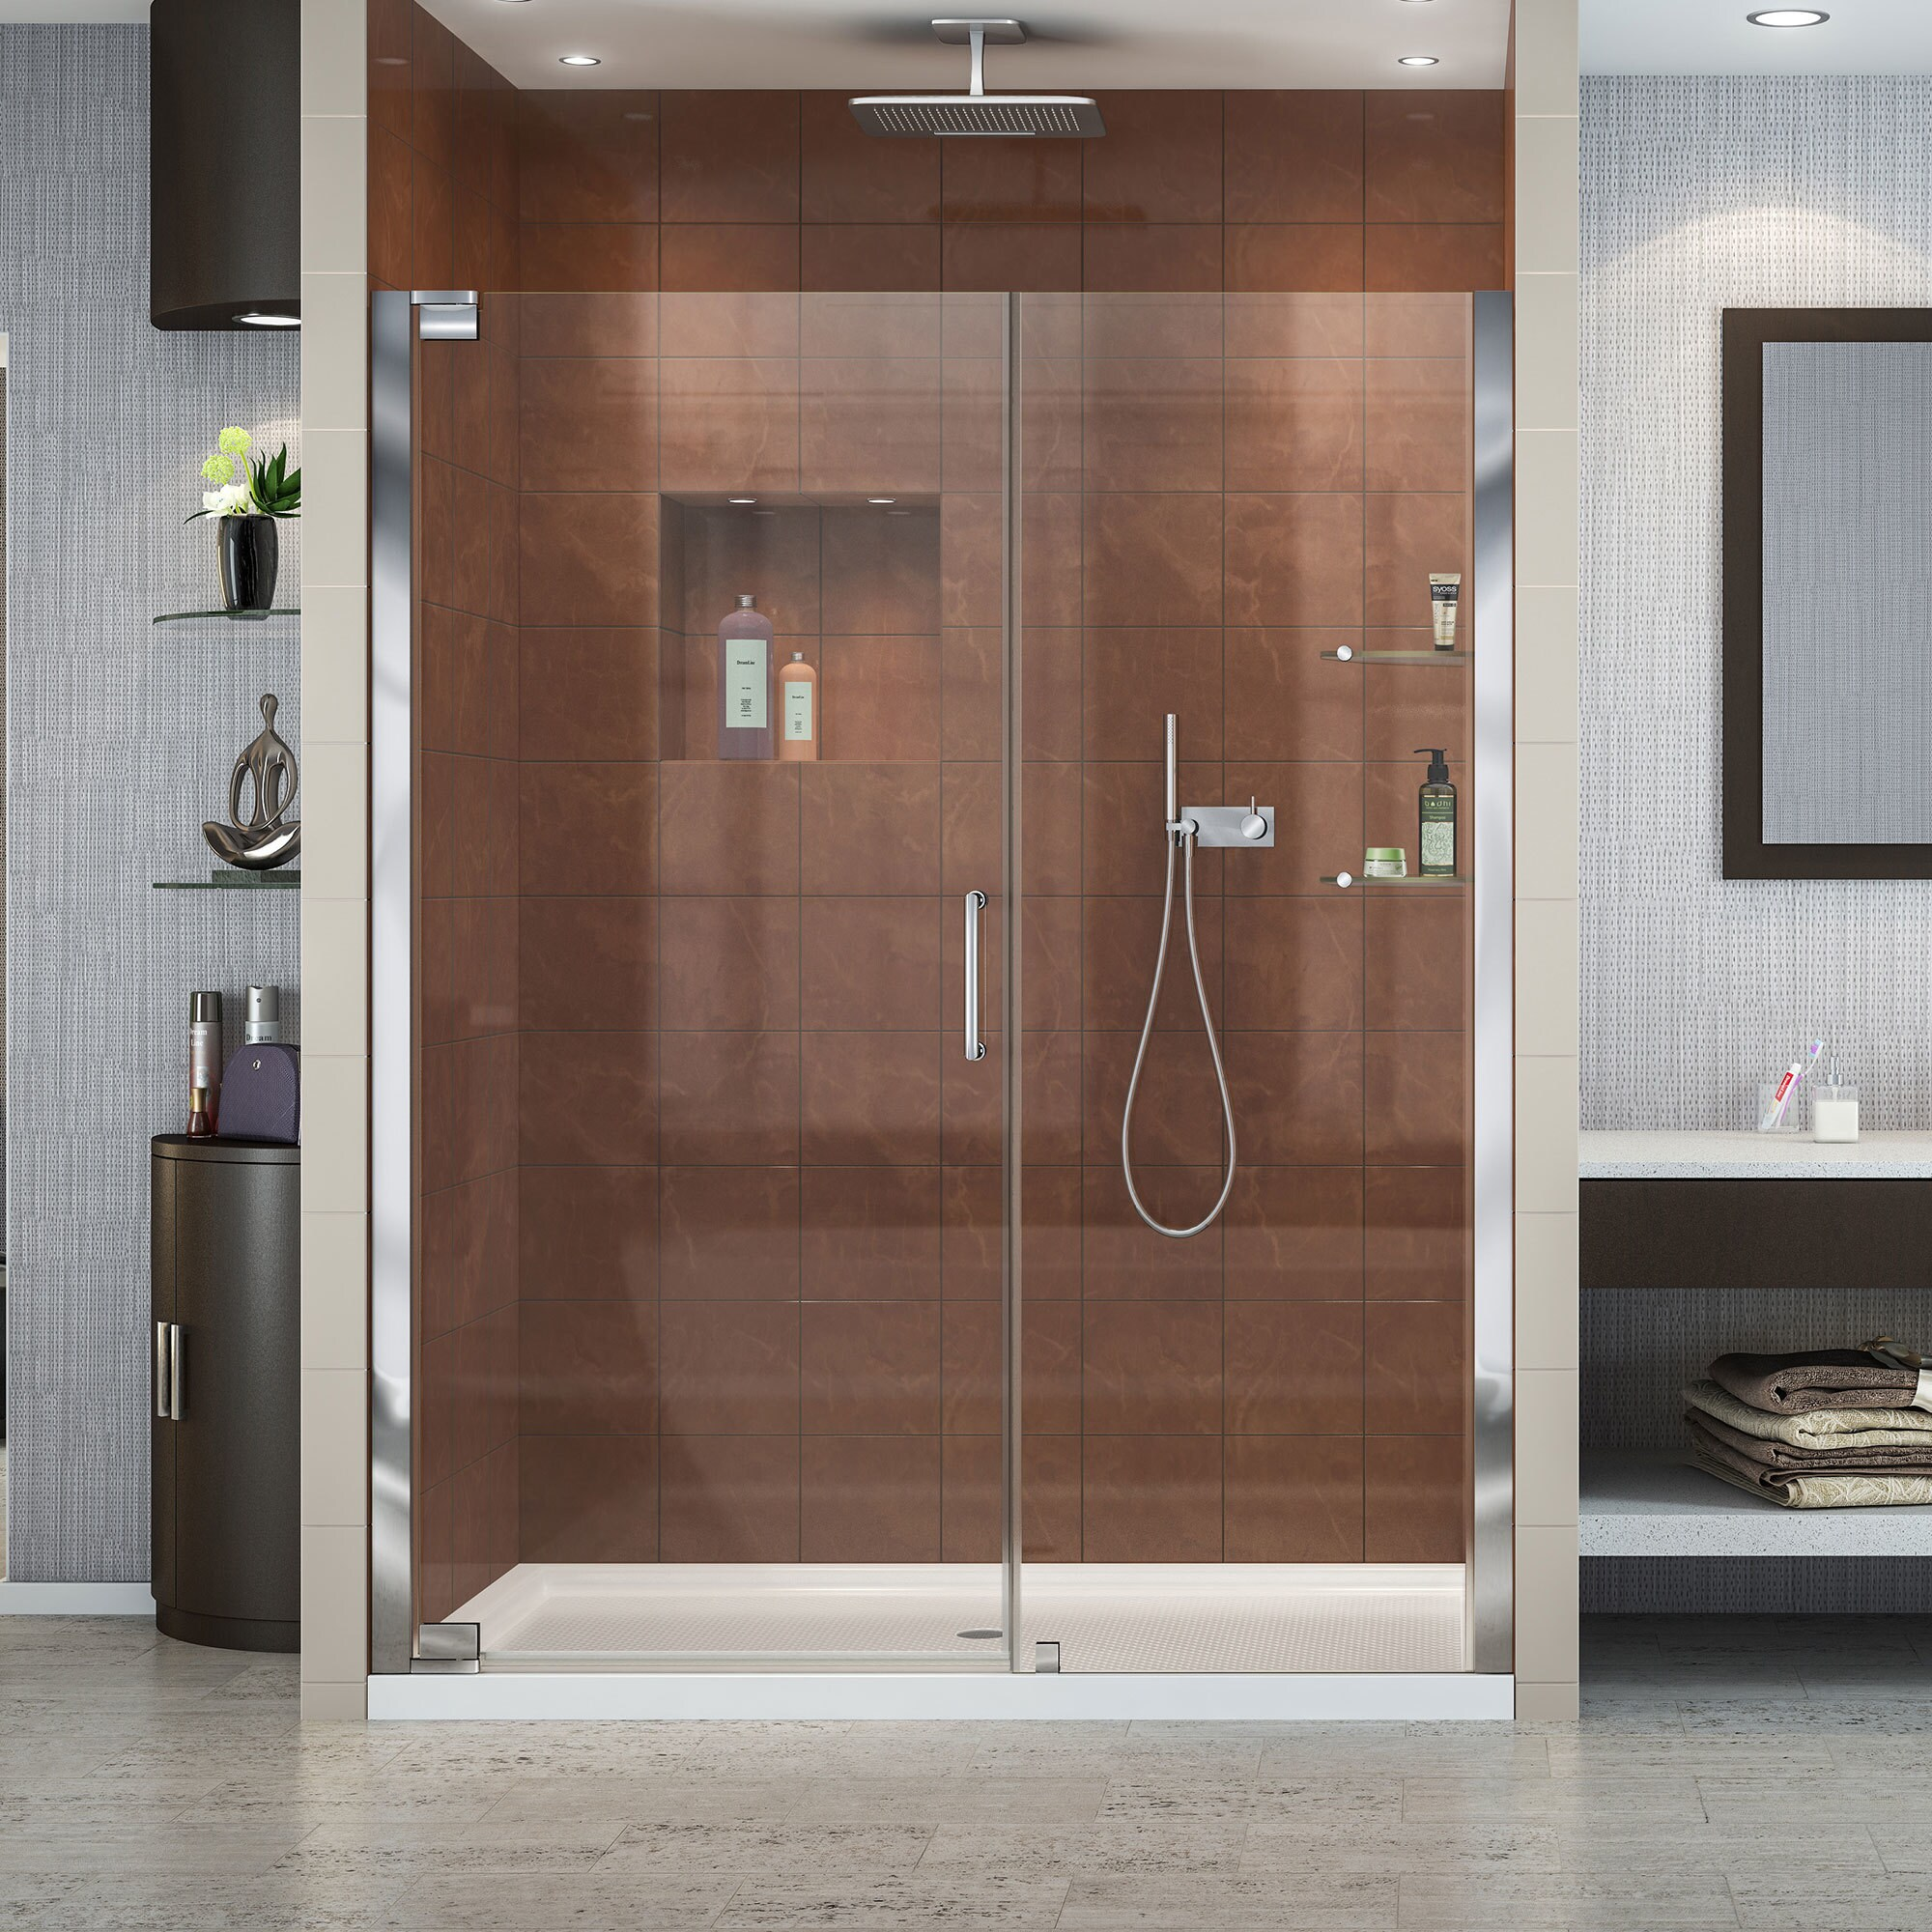 DreamLine Elegance Frameless Pivot Shower Door and SlimLine 32 in. by 60 in. Single Threshold Shower (Brushed Nickel Hardware; Biscuit Base; Center